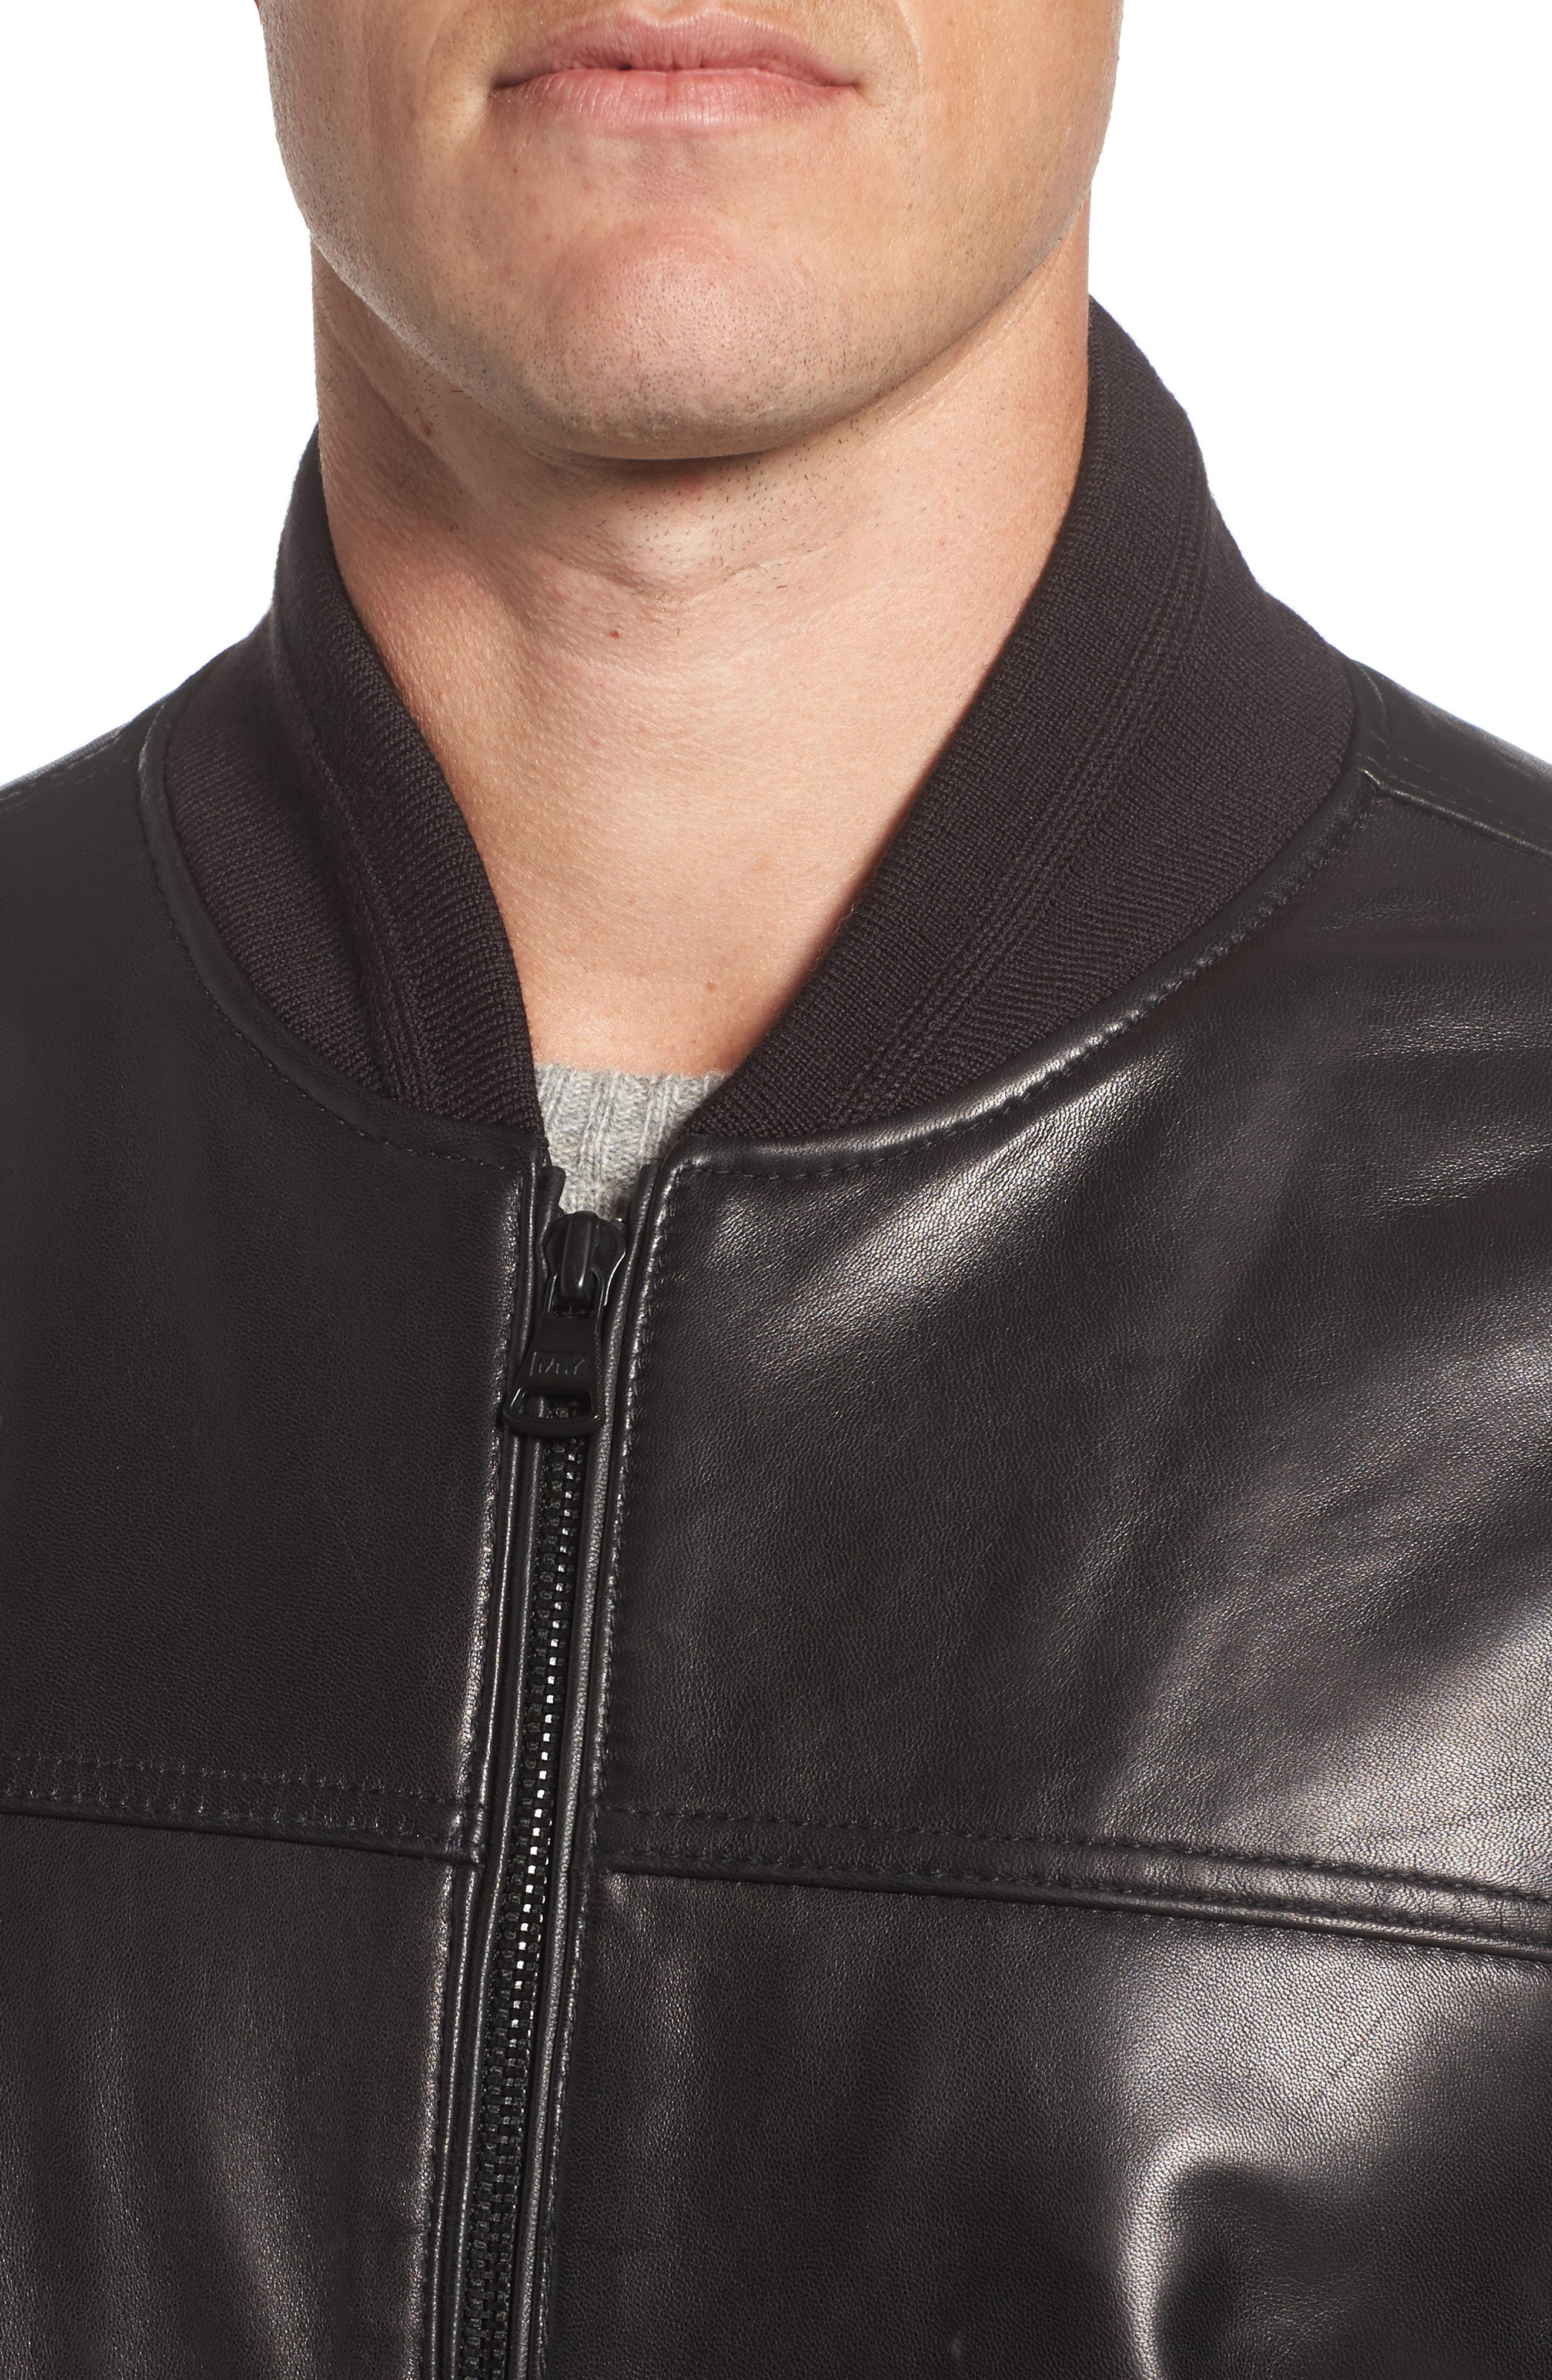 Summit Leather Bomber Jacket,                             Alternate thumbnail 4, color,                             Black